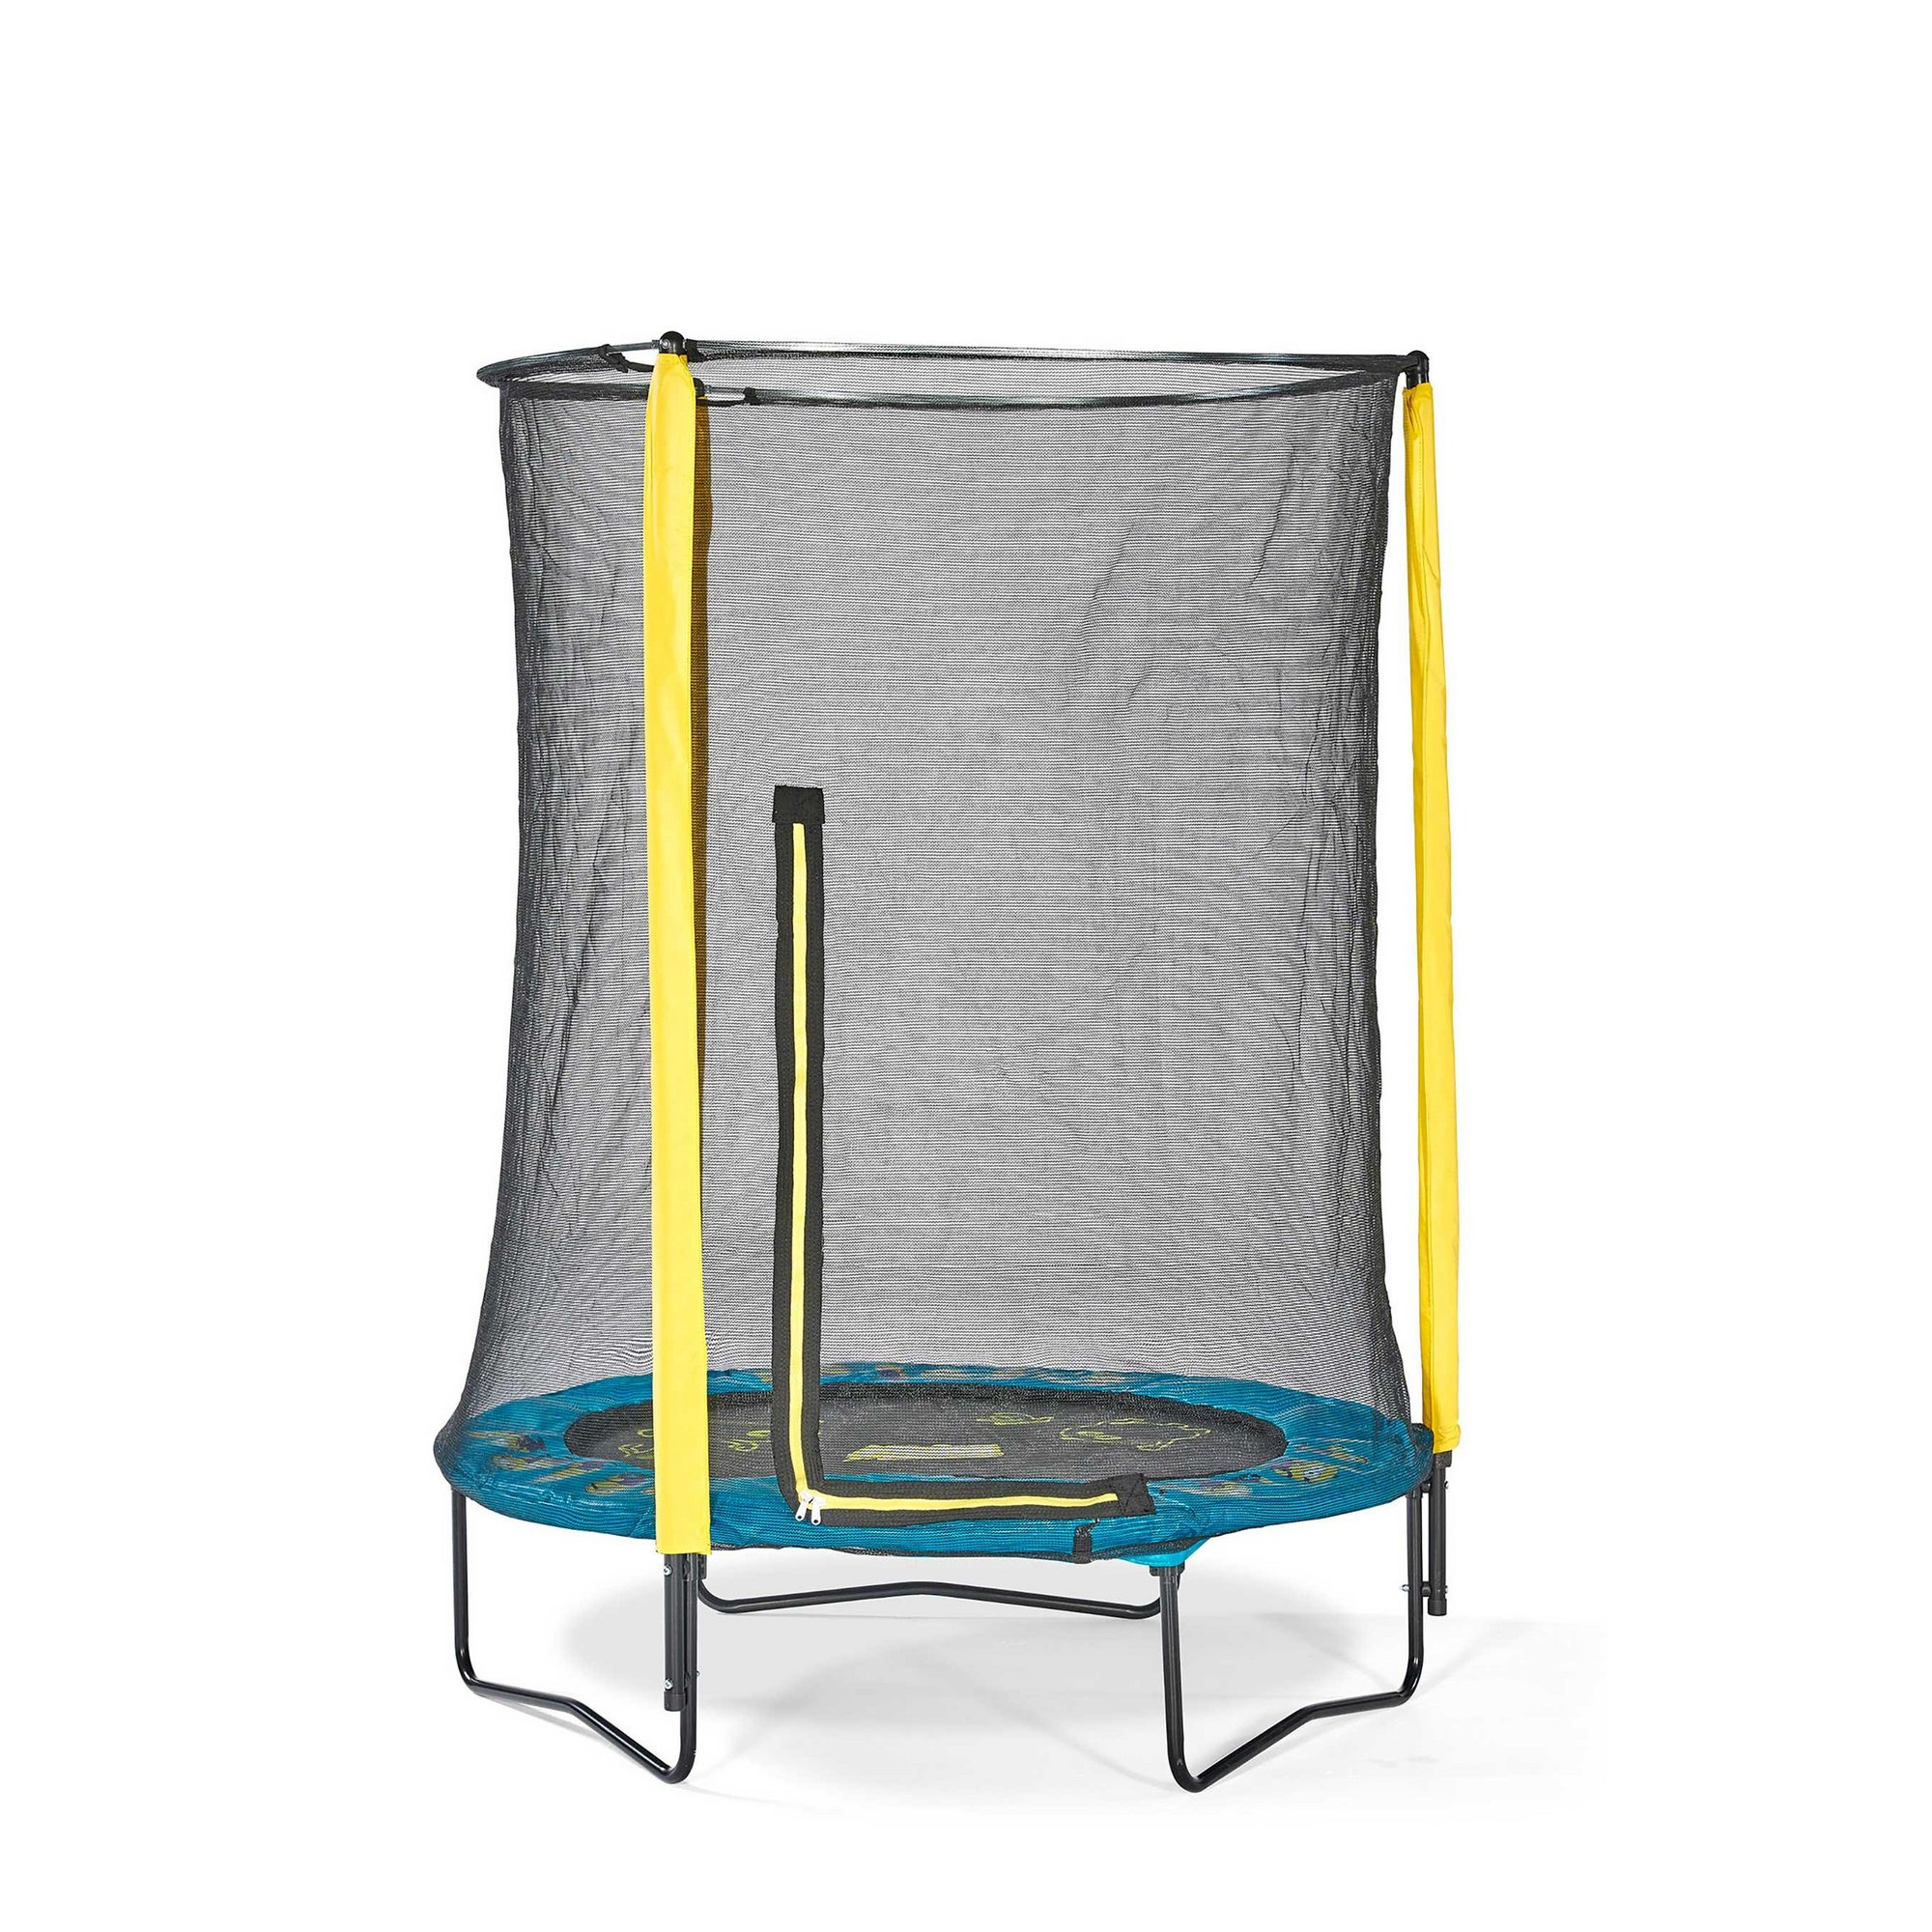 Image of Plum Minions 4.5ft Trampoline